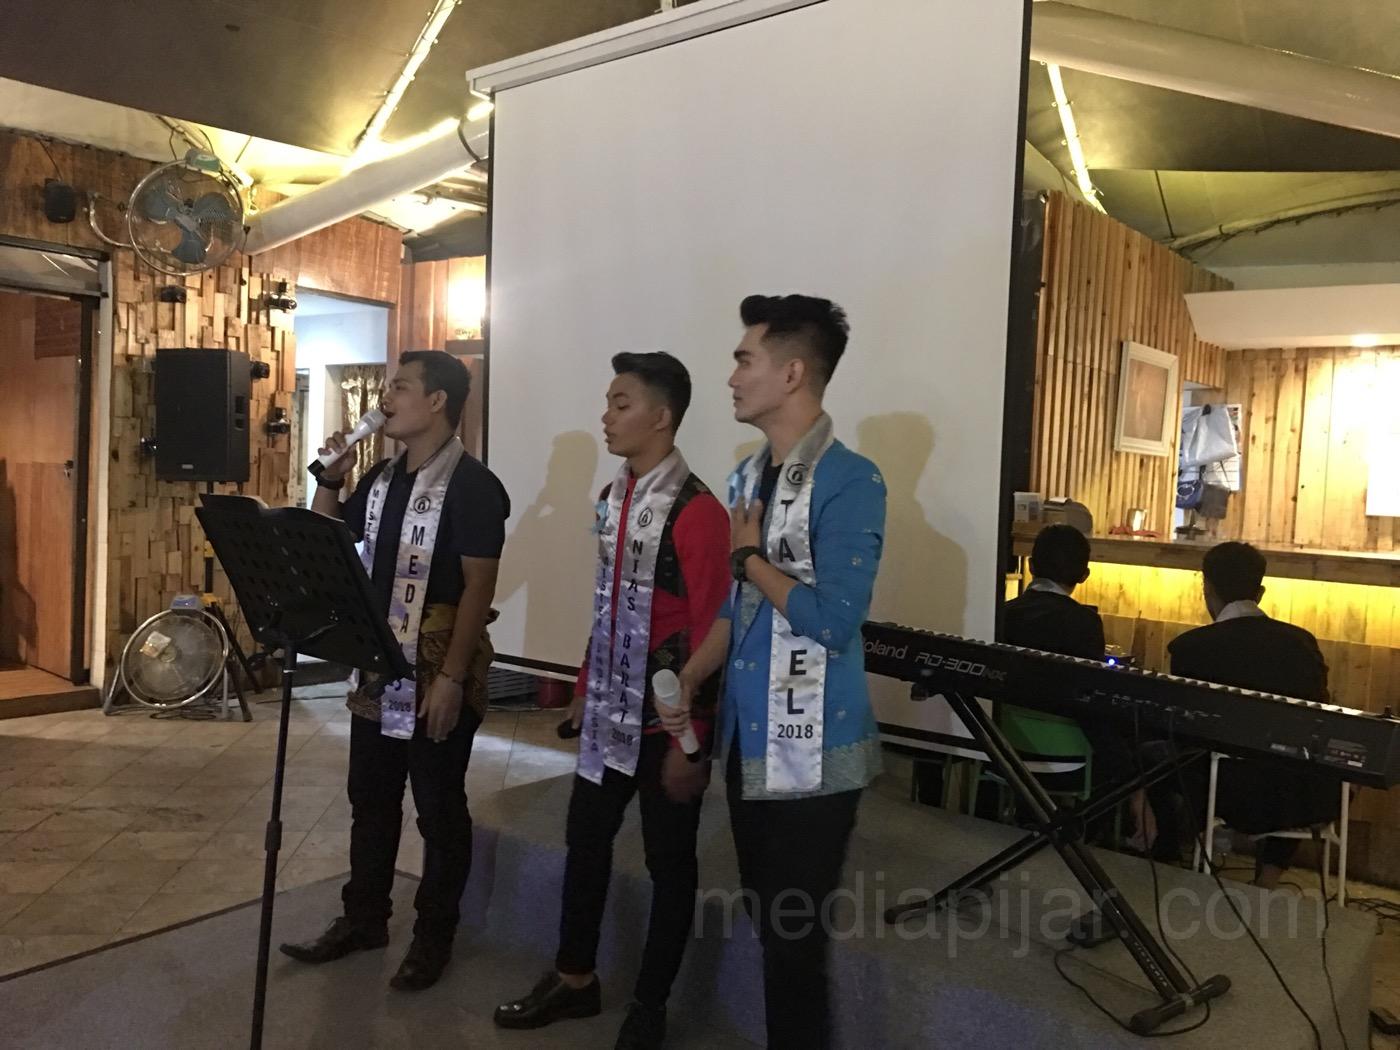 Musikalisasi puisi oleh Finalis Mister Indonesia Sumatera Utara 2018 dalam kegiatan aksi peduli korban Sinabung di kafe Potret Merdeka Walk pada Sabtu (24/3). (Fotografer: Lucky Andriansyah)